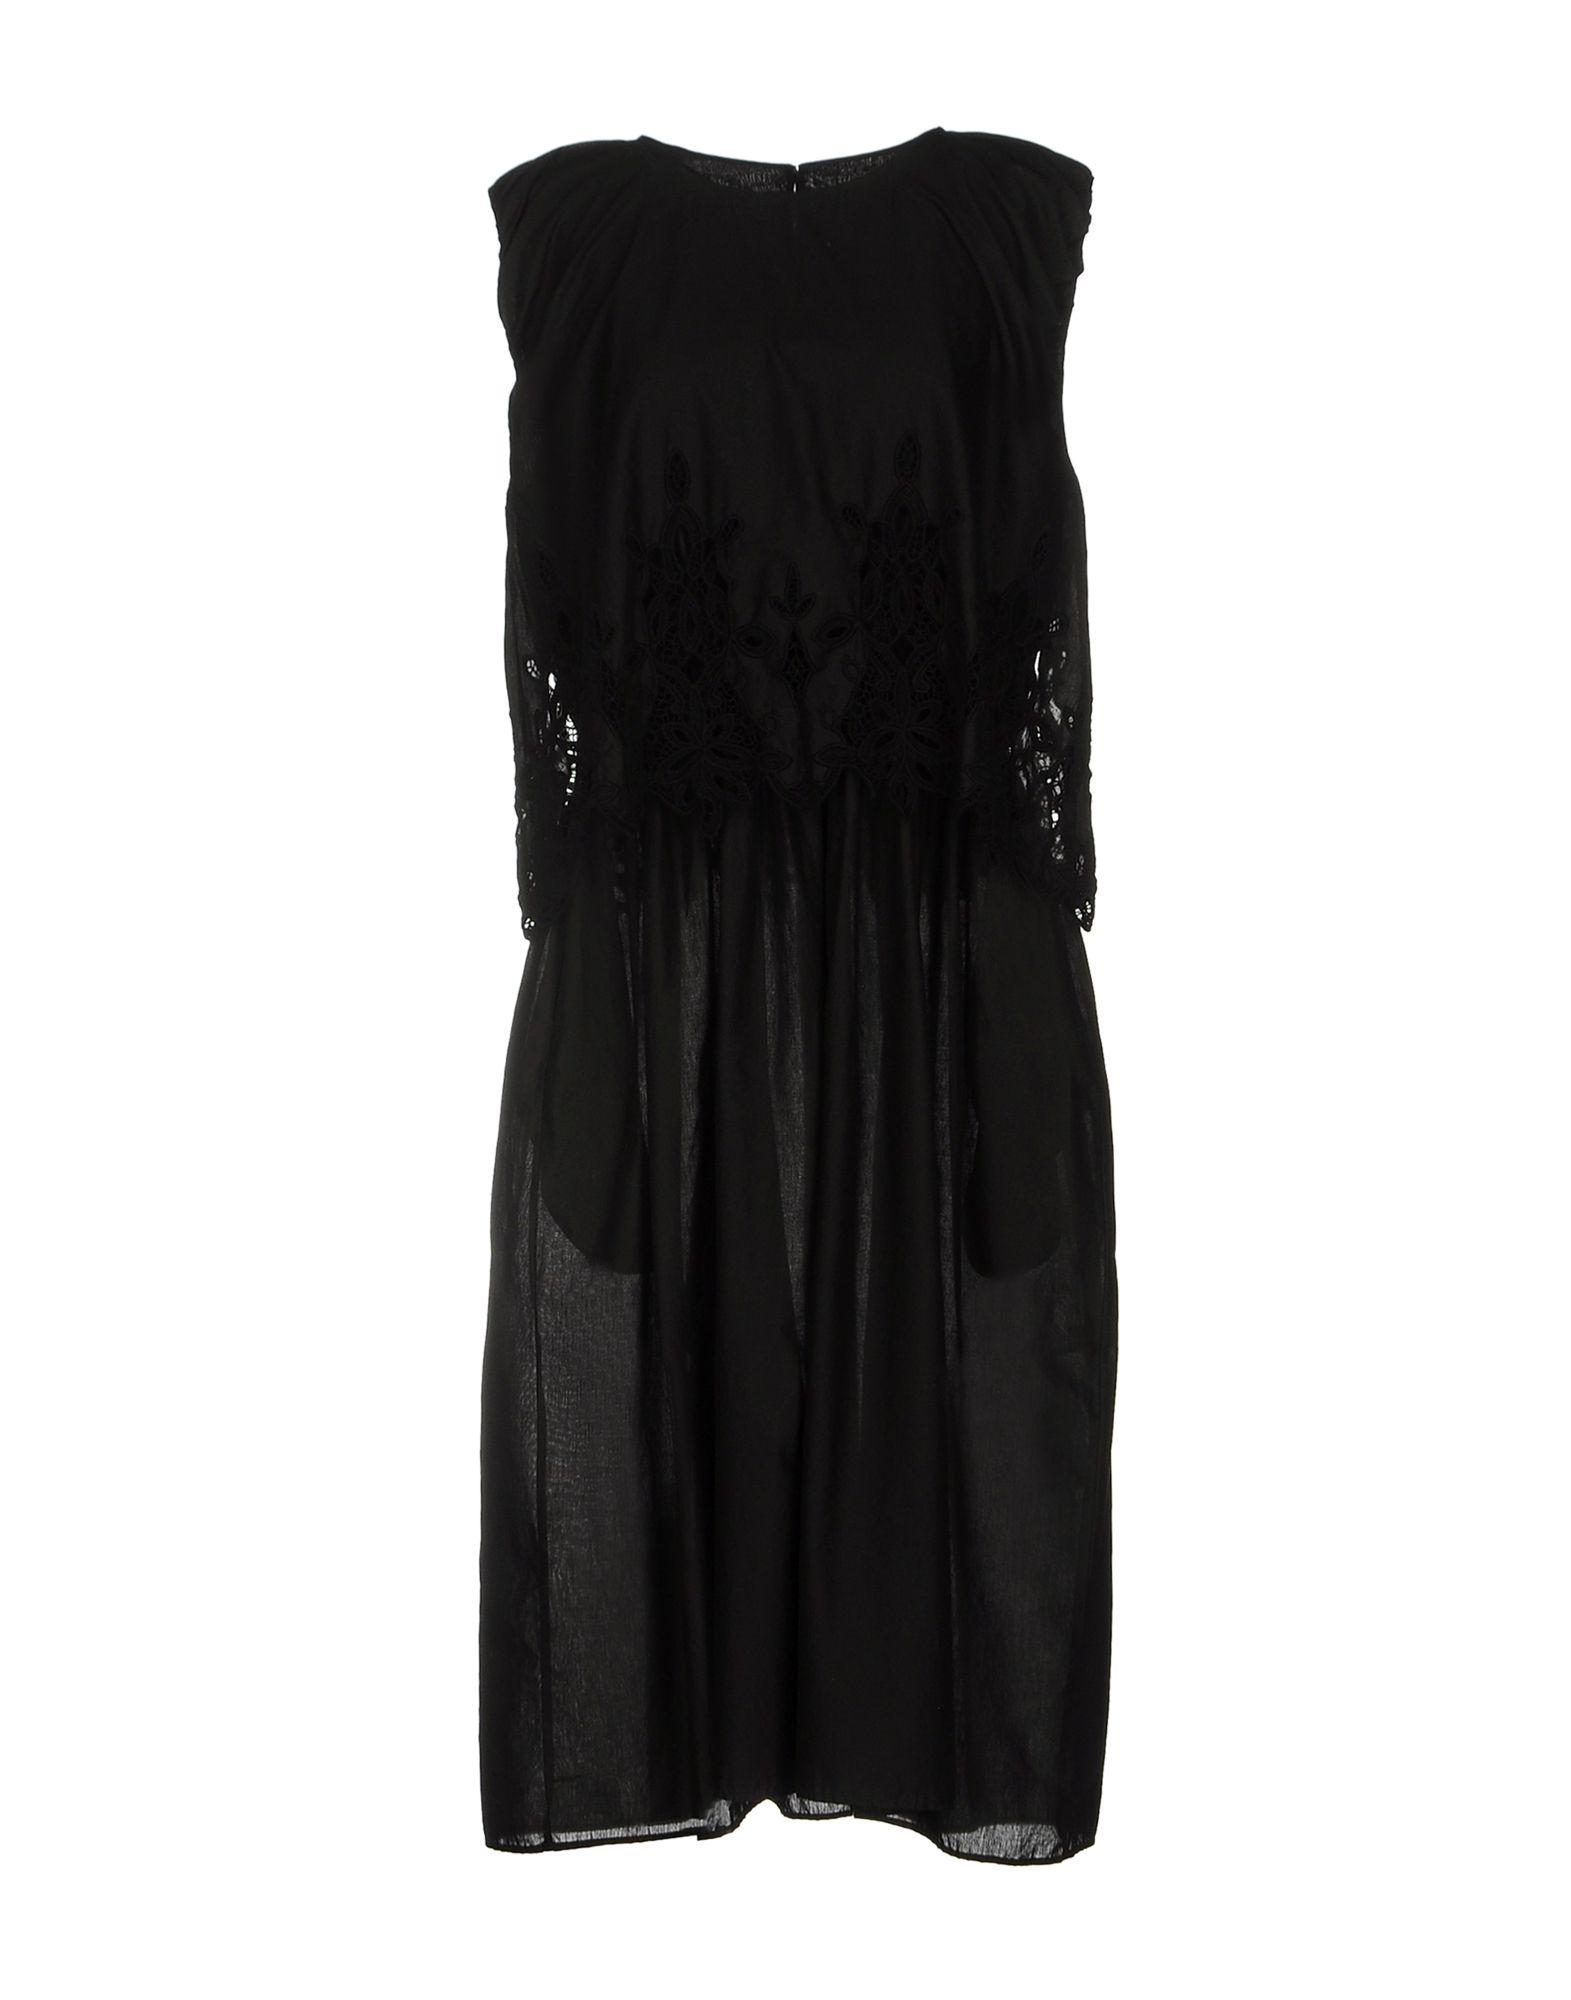 ZUCCA Платье длиной 3/4 lisa corti платье длиной 3 4